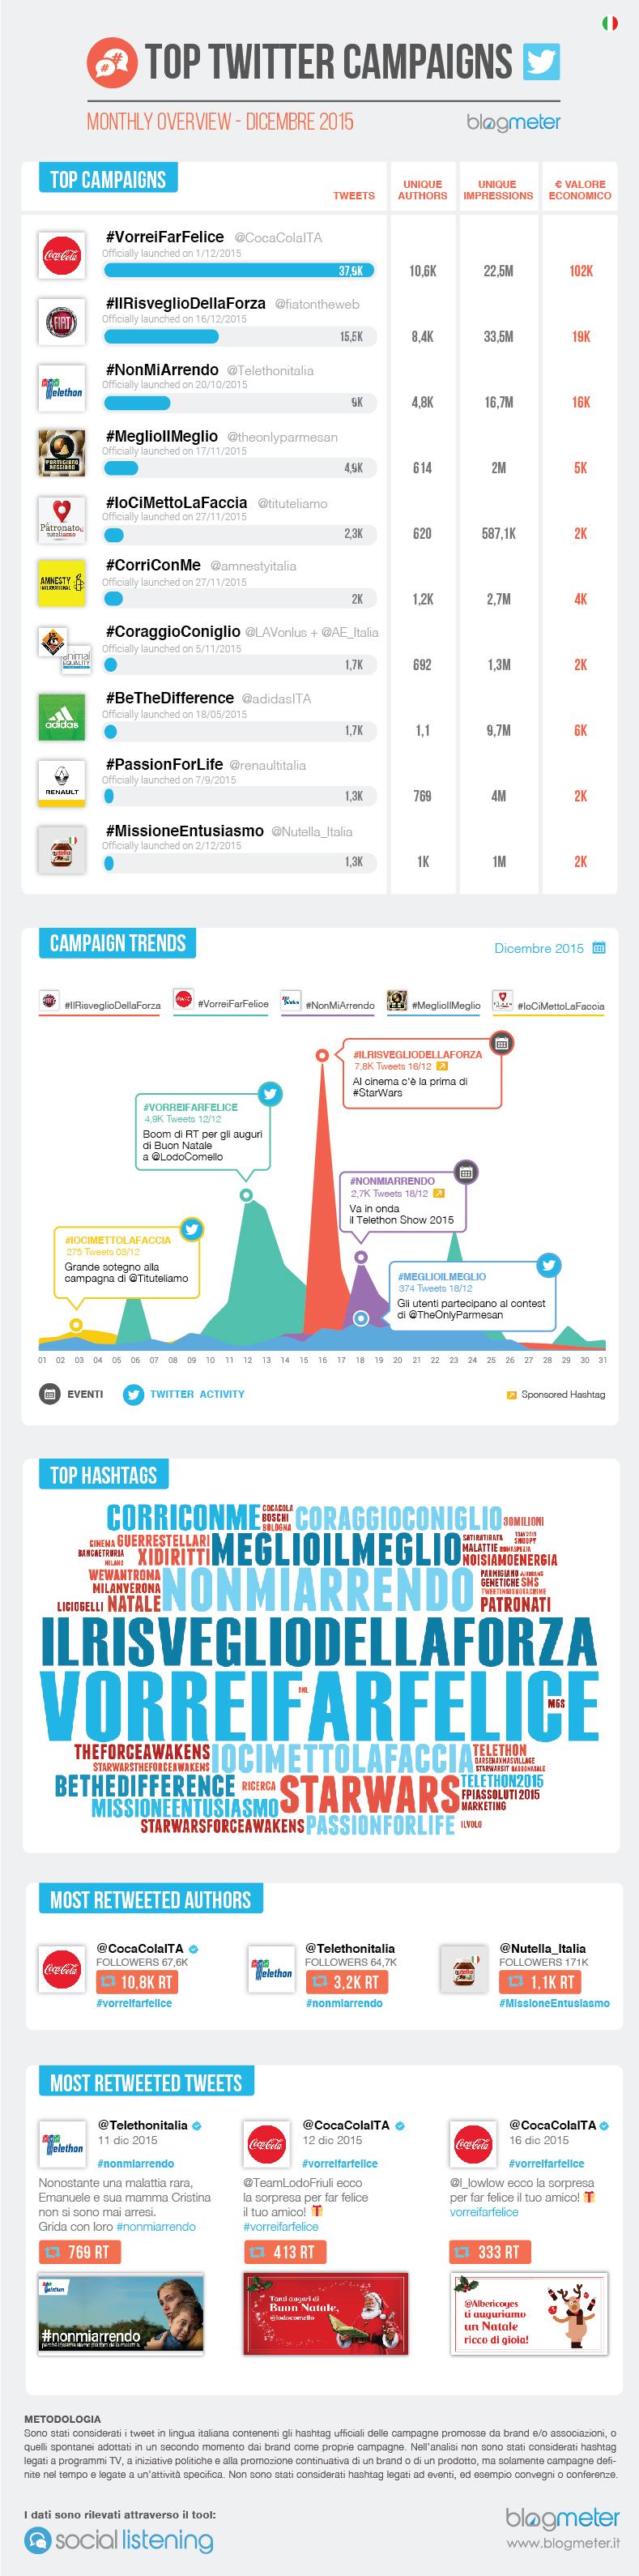 infografica Blogmeter twitter dicembre